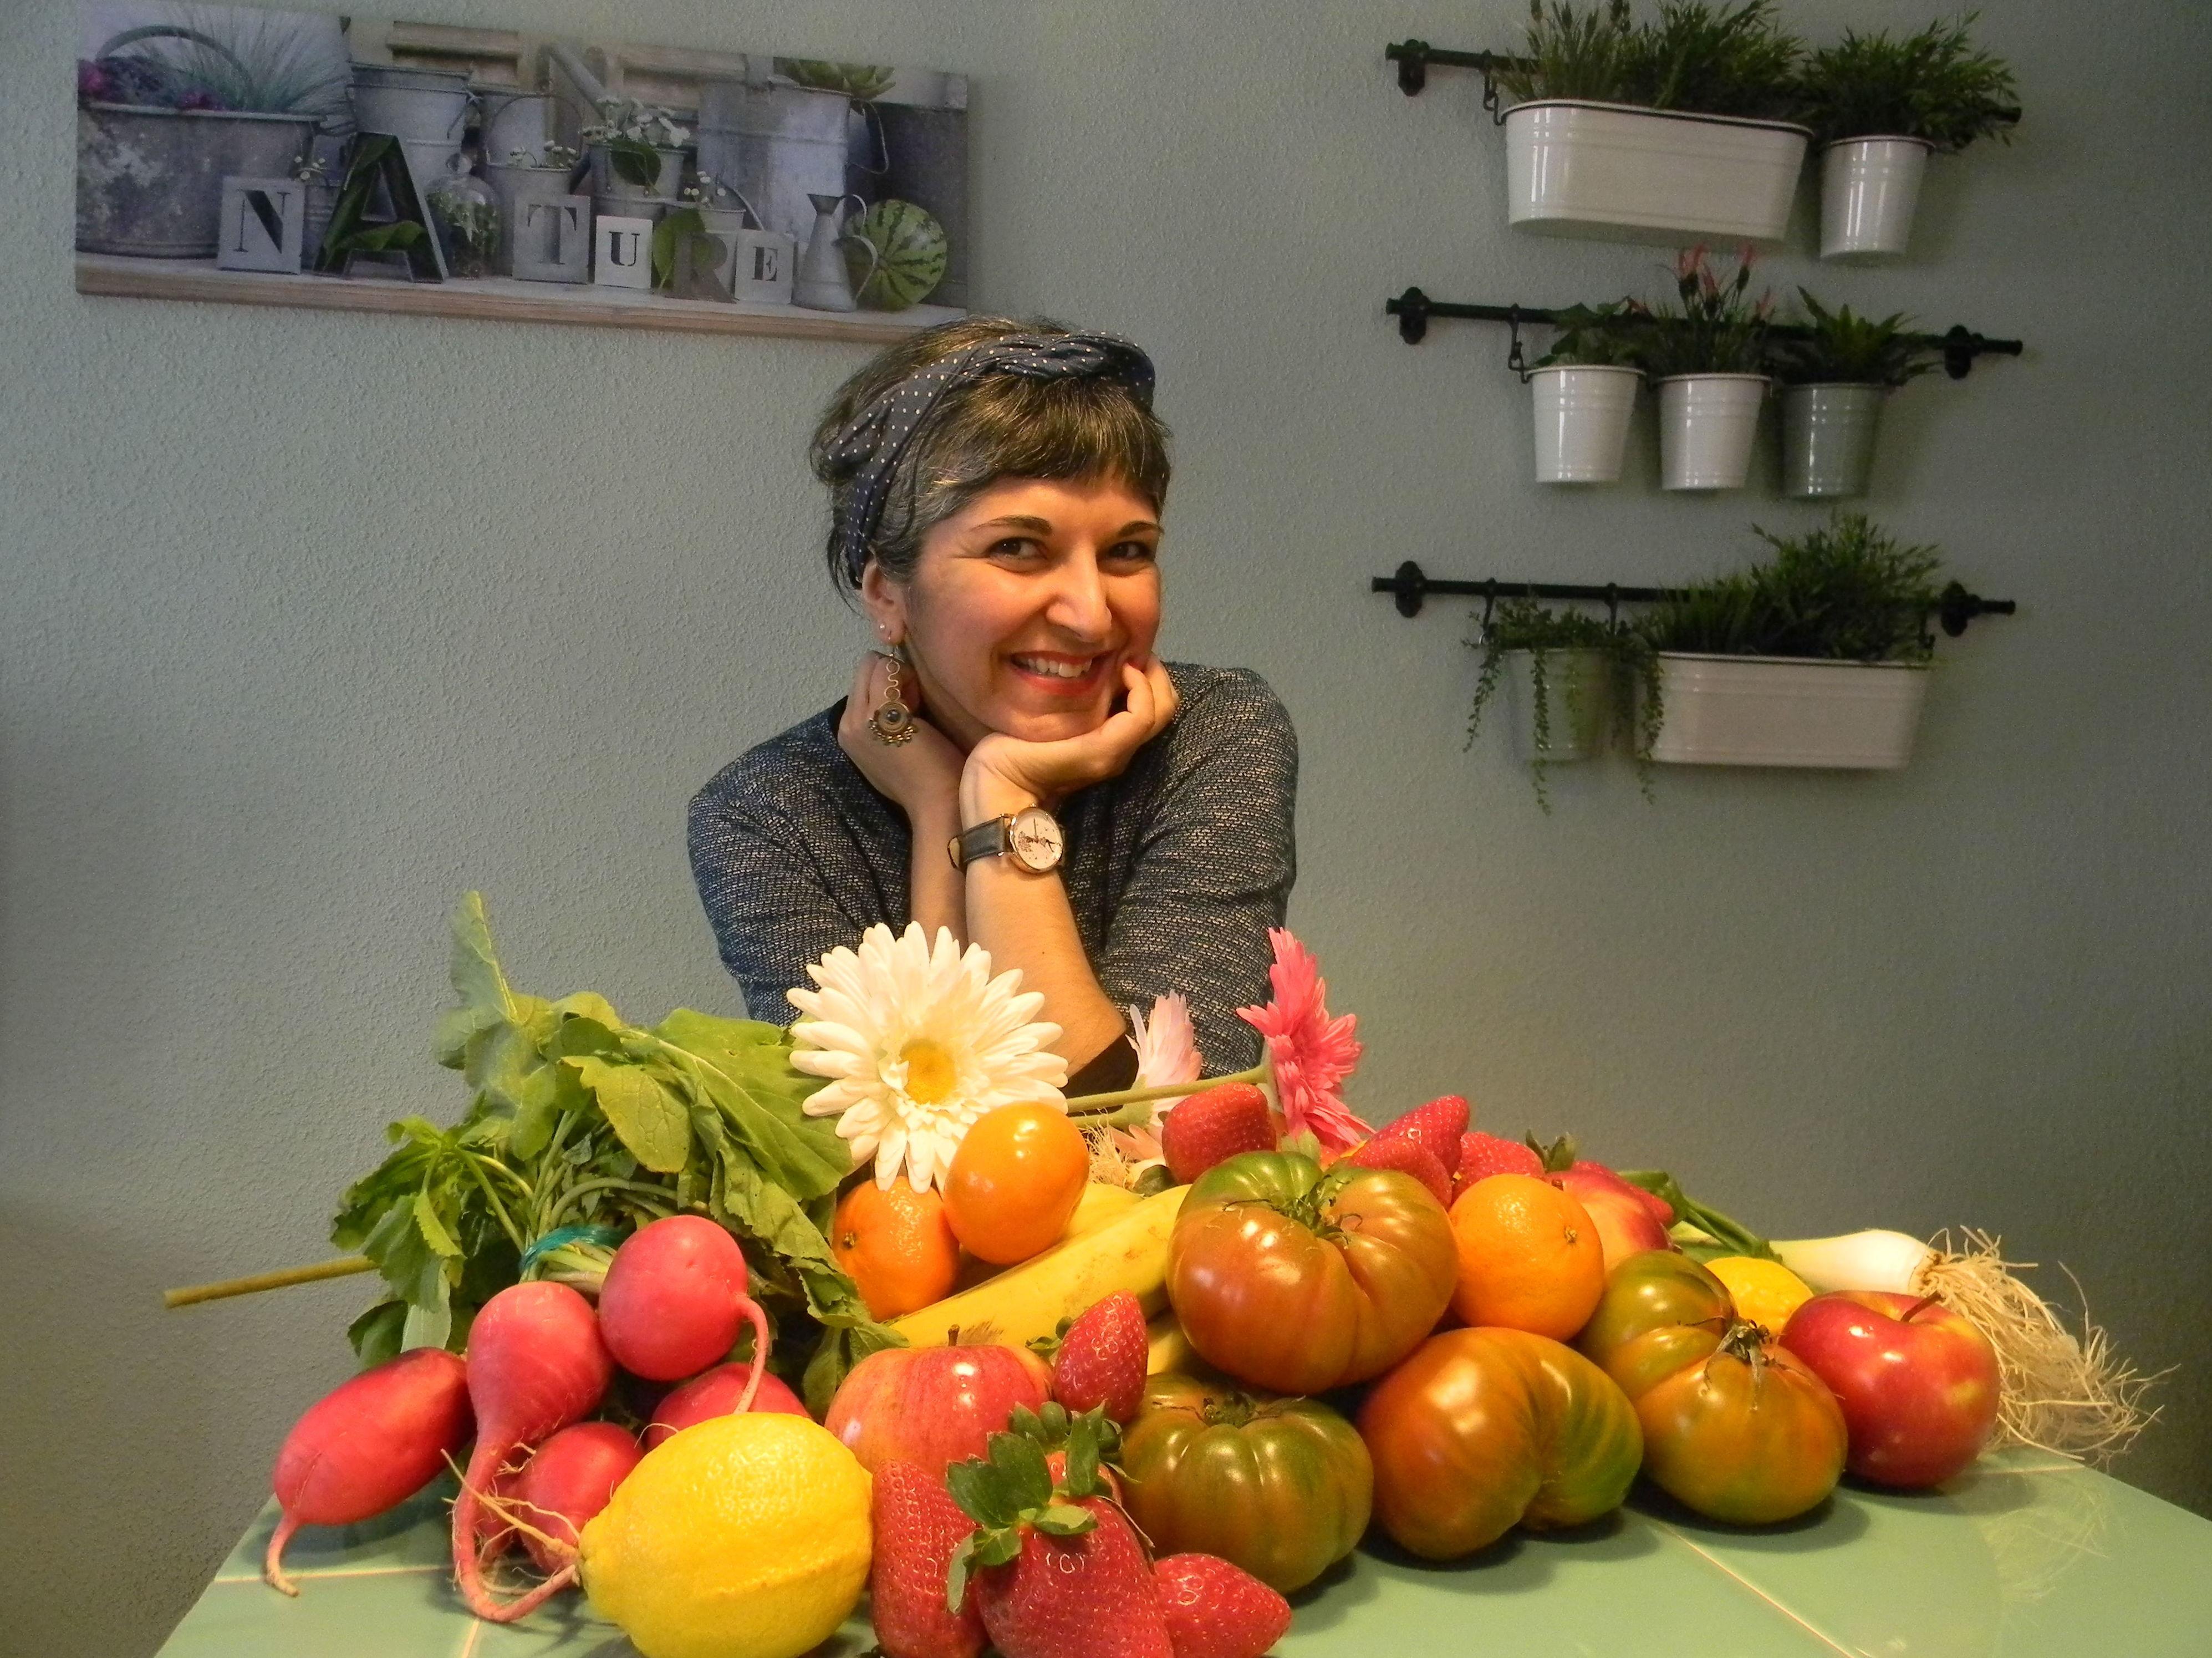 ENGLISH - Vegan Lifestyle Coaching: La consulta/The practice de Parisa Salahshourian, Terapias Naturales & Vida Vegana